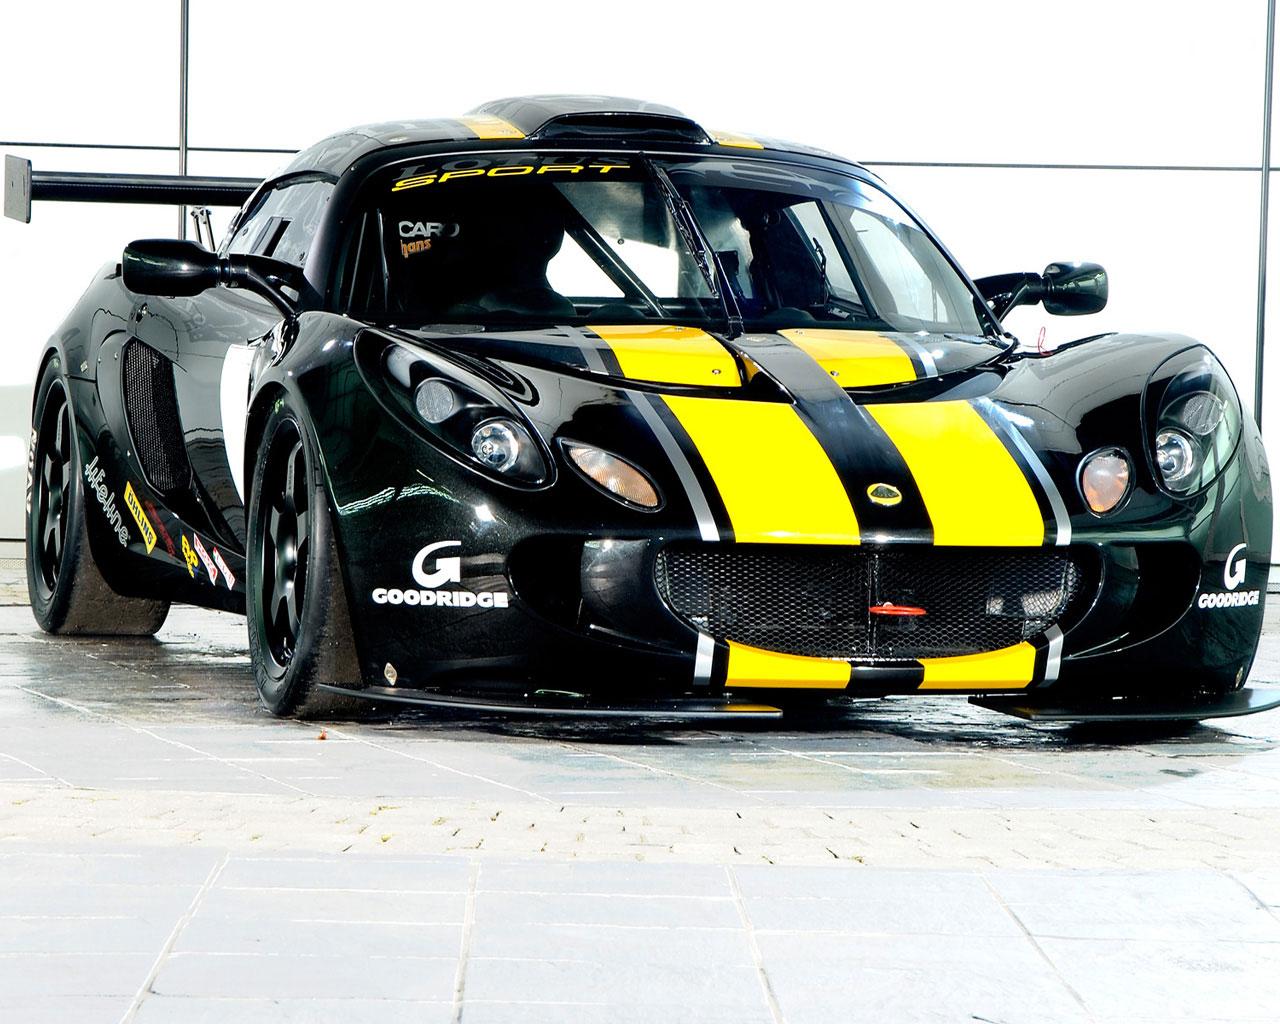 Sports Cars Wallpapers Racing Cars Street Racing Cars 1280x1024